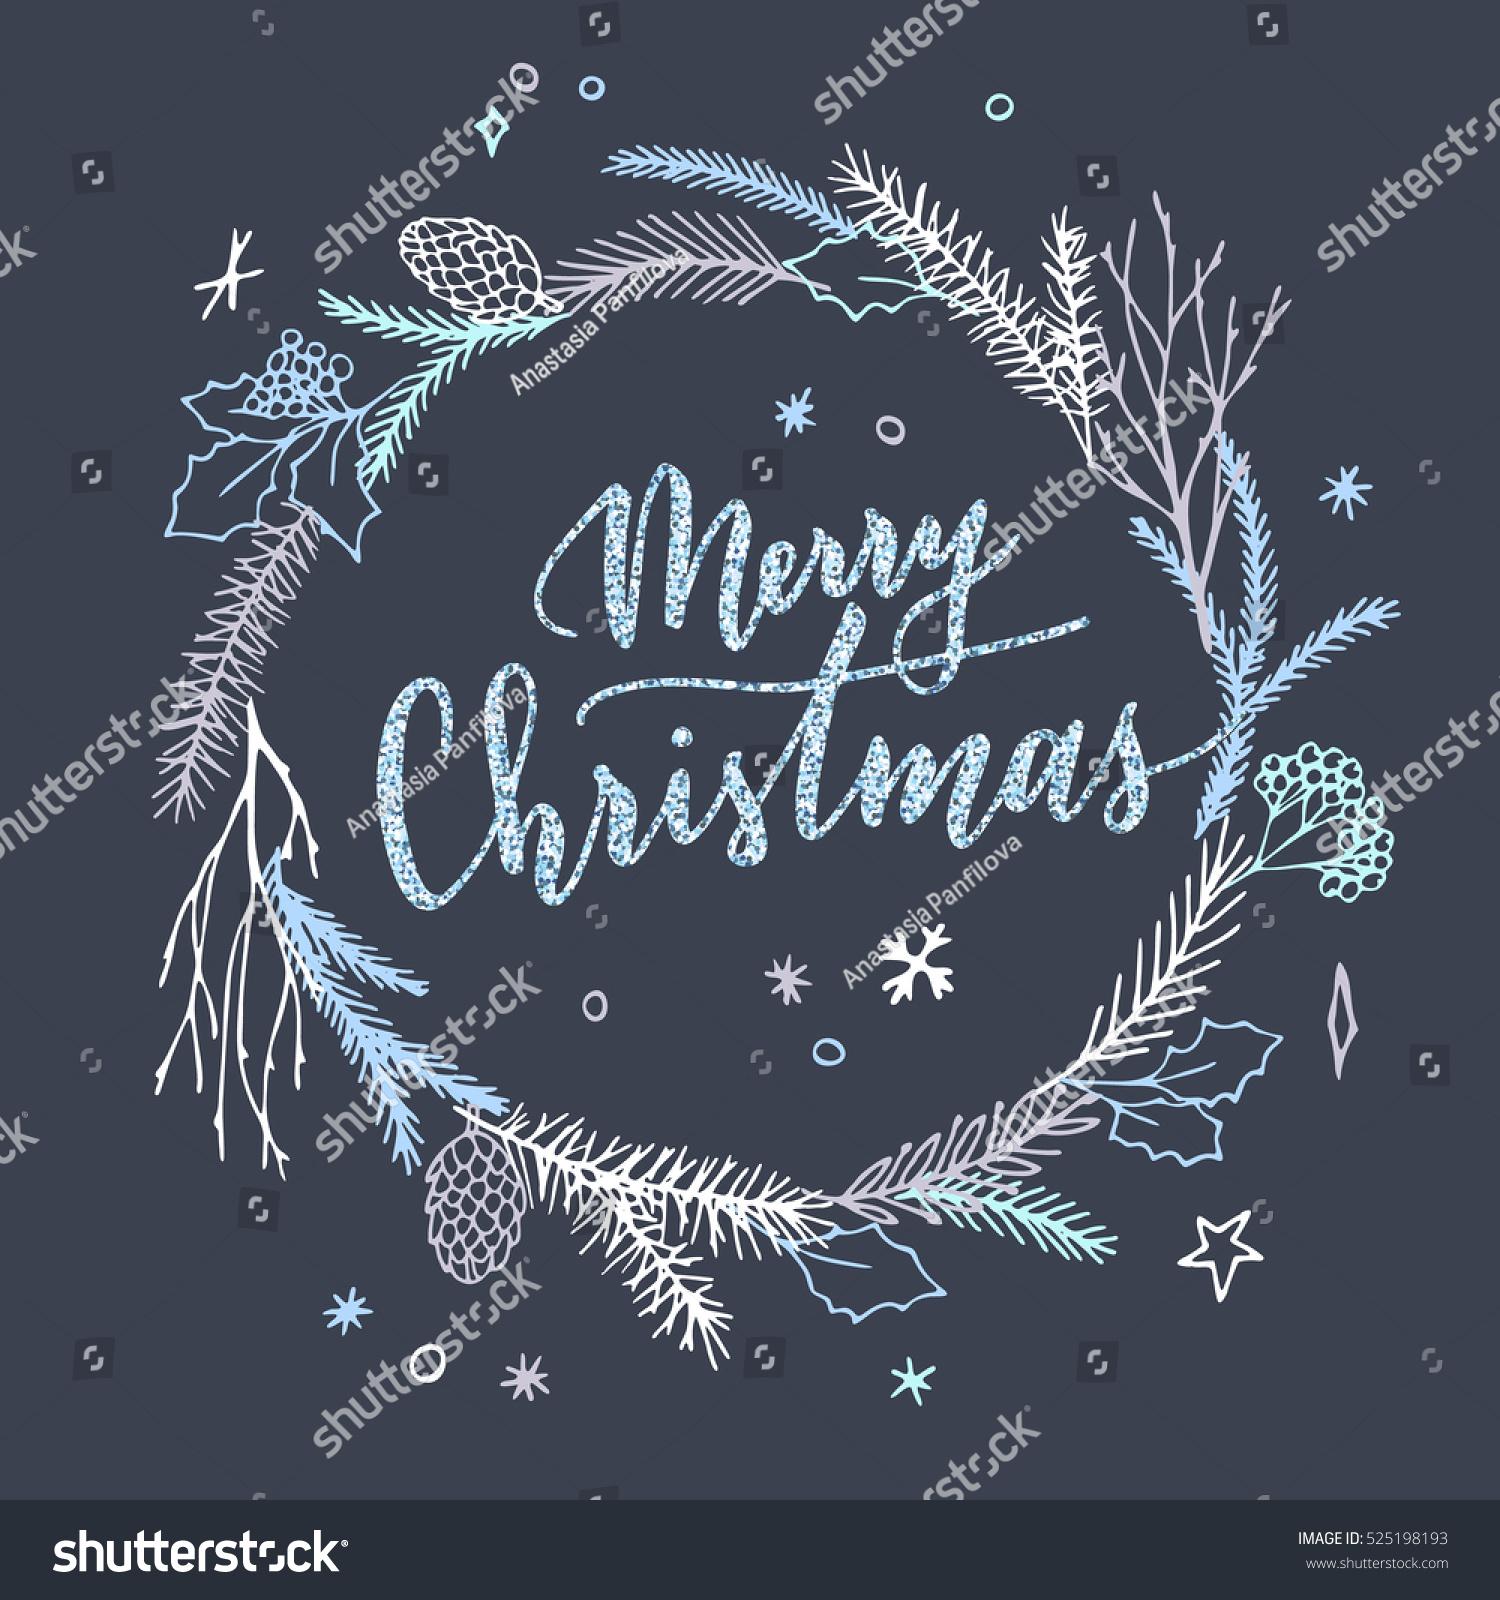 Vector hand drawn christmas card elegant minimalist for Minimalist christmas